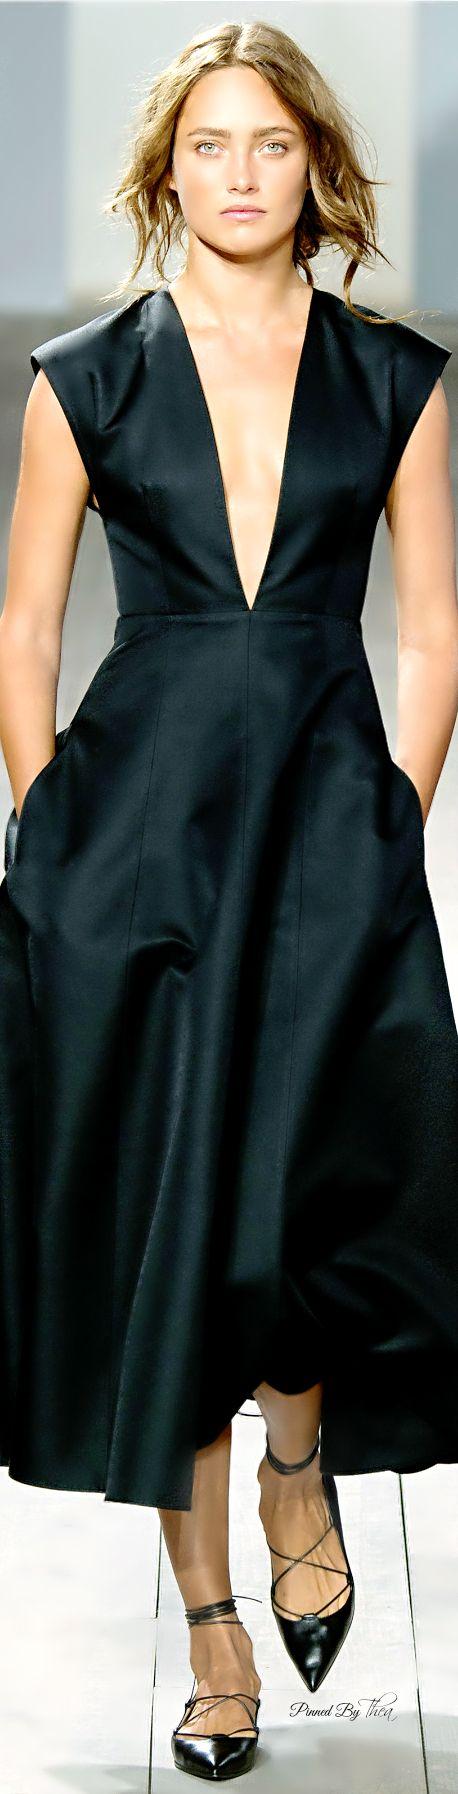 designers like michael kors wq03  Michael Kors  SS 2015